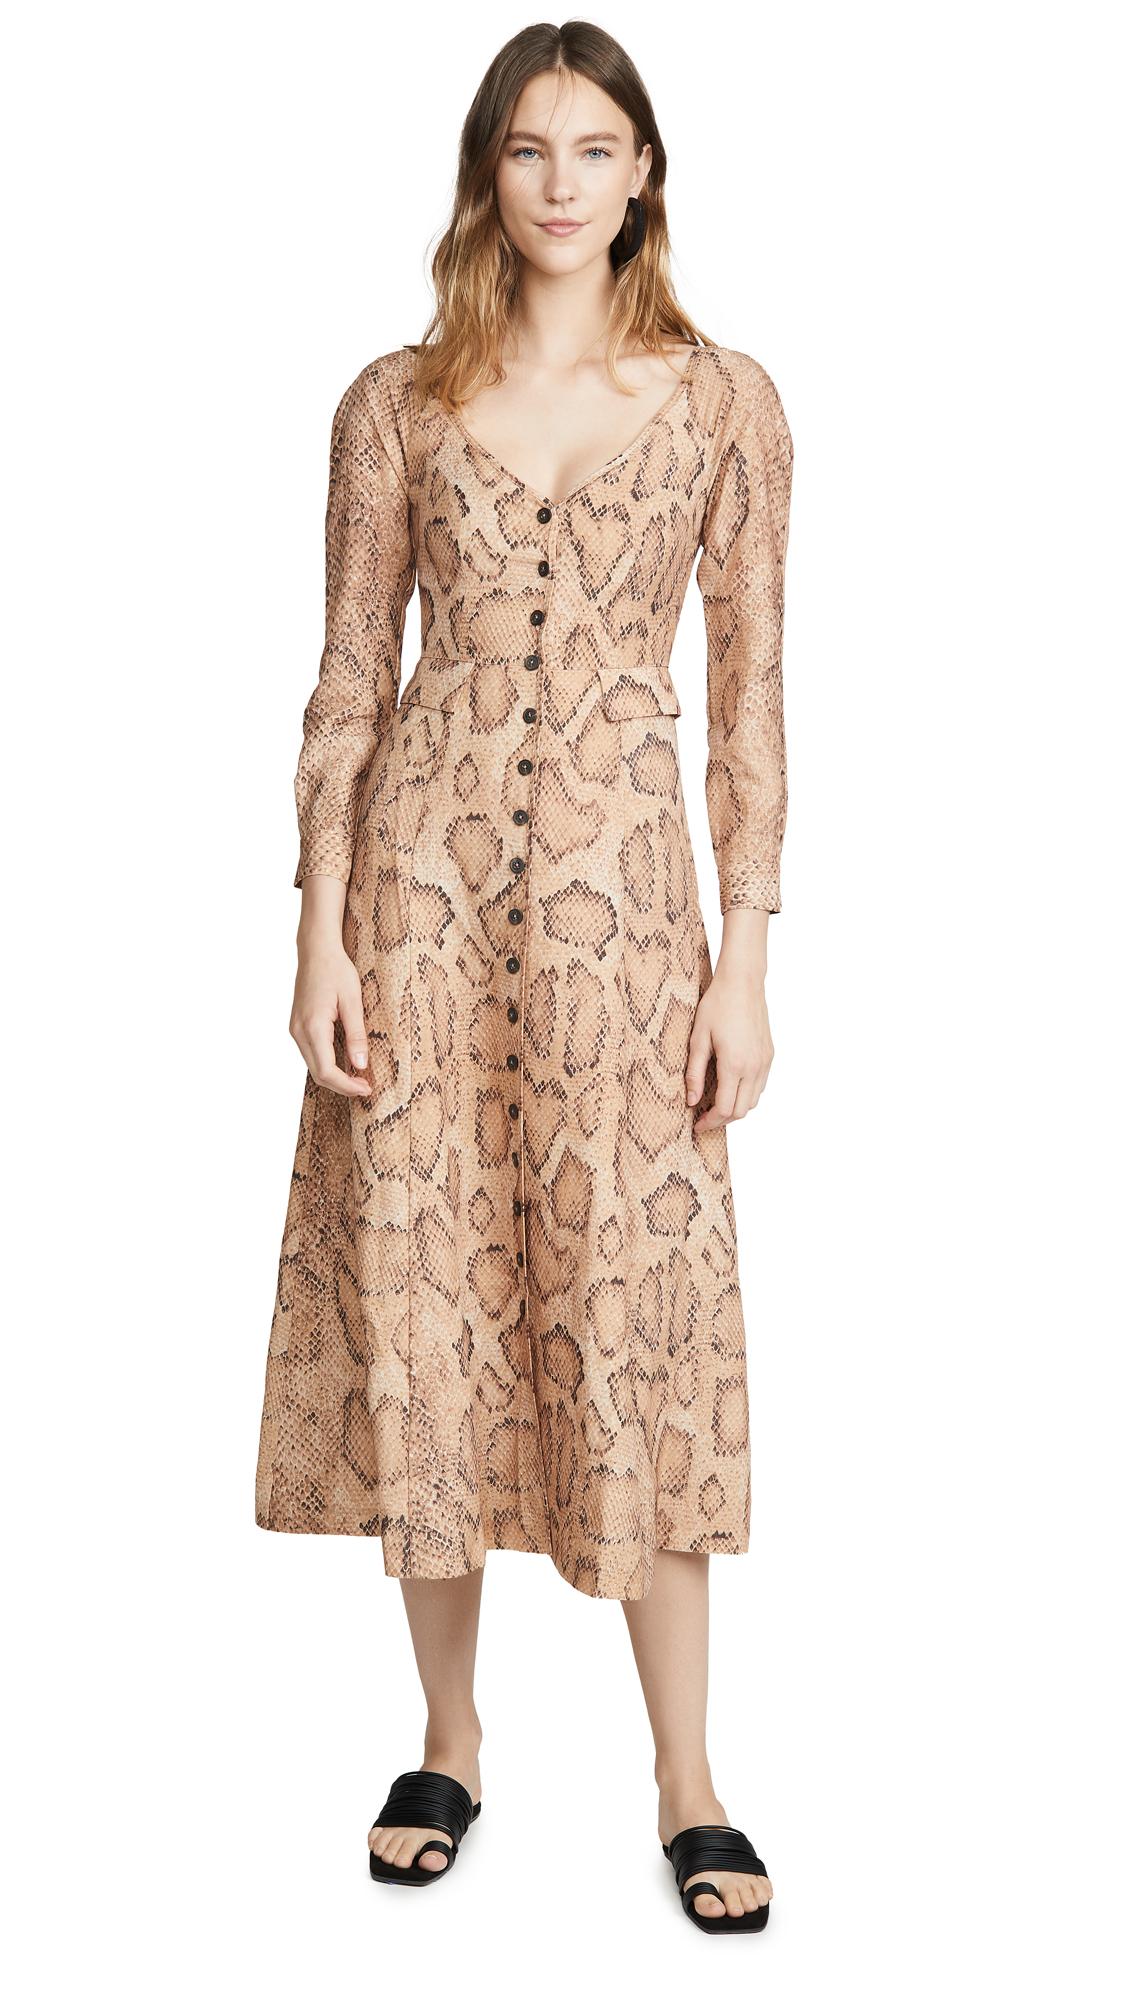 Mara Hoffman Silvana Dress – 60% Off Sale